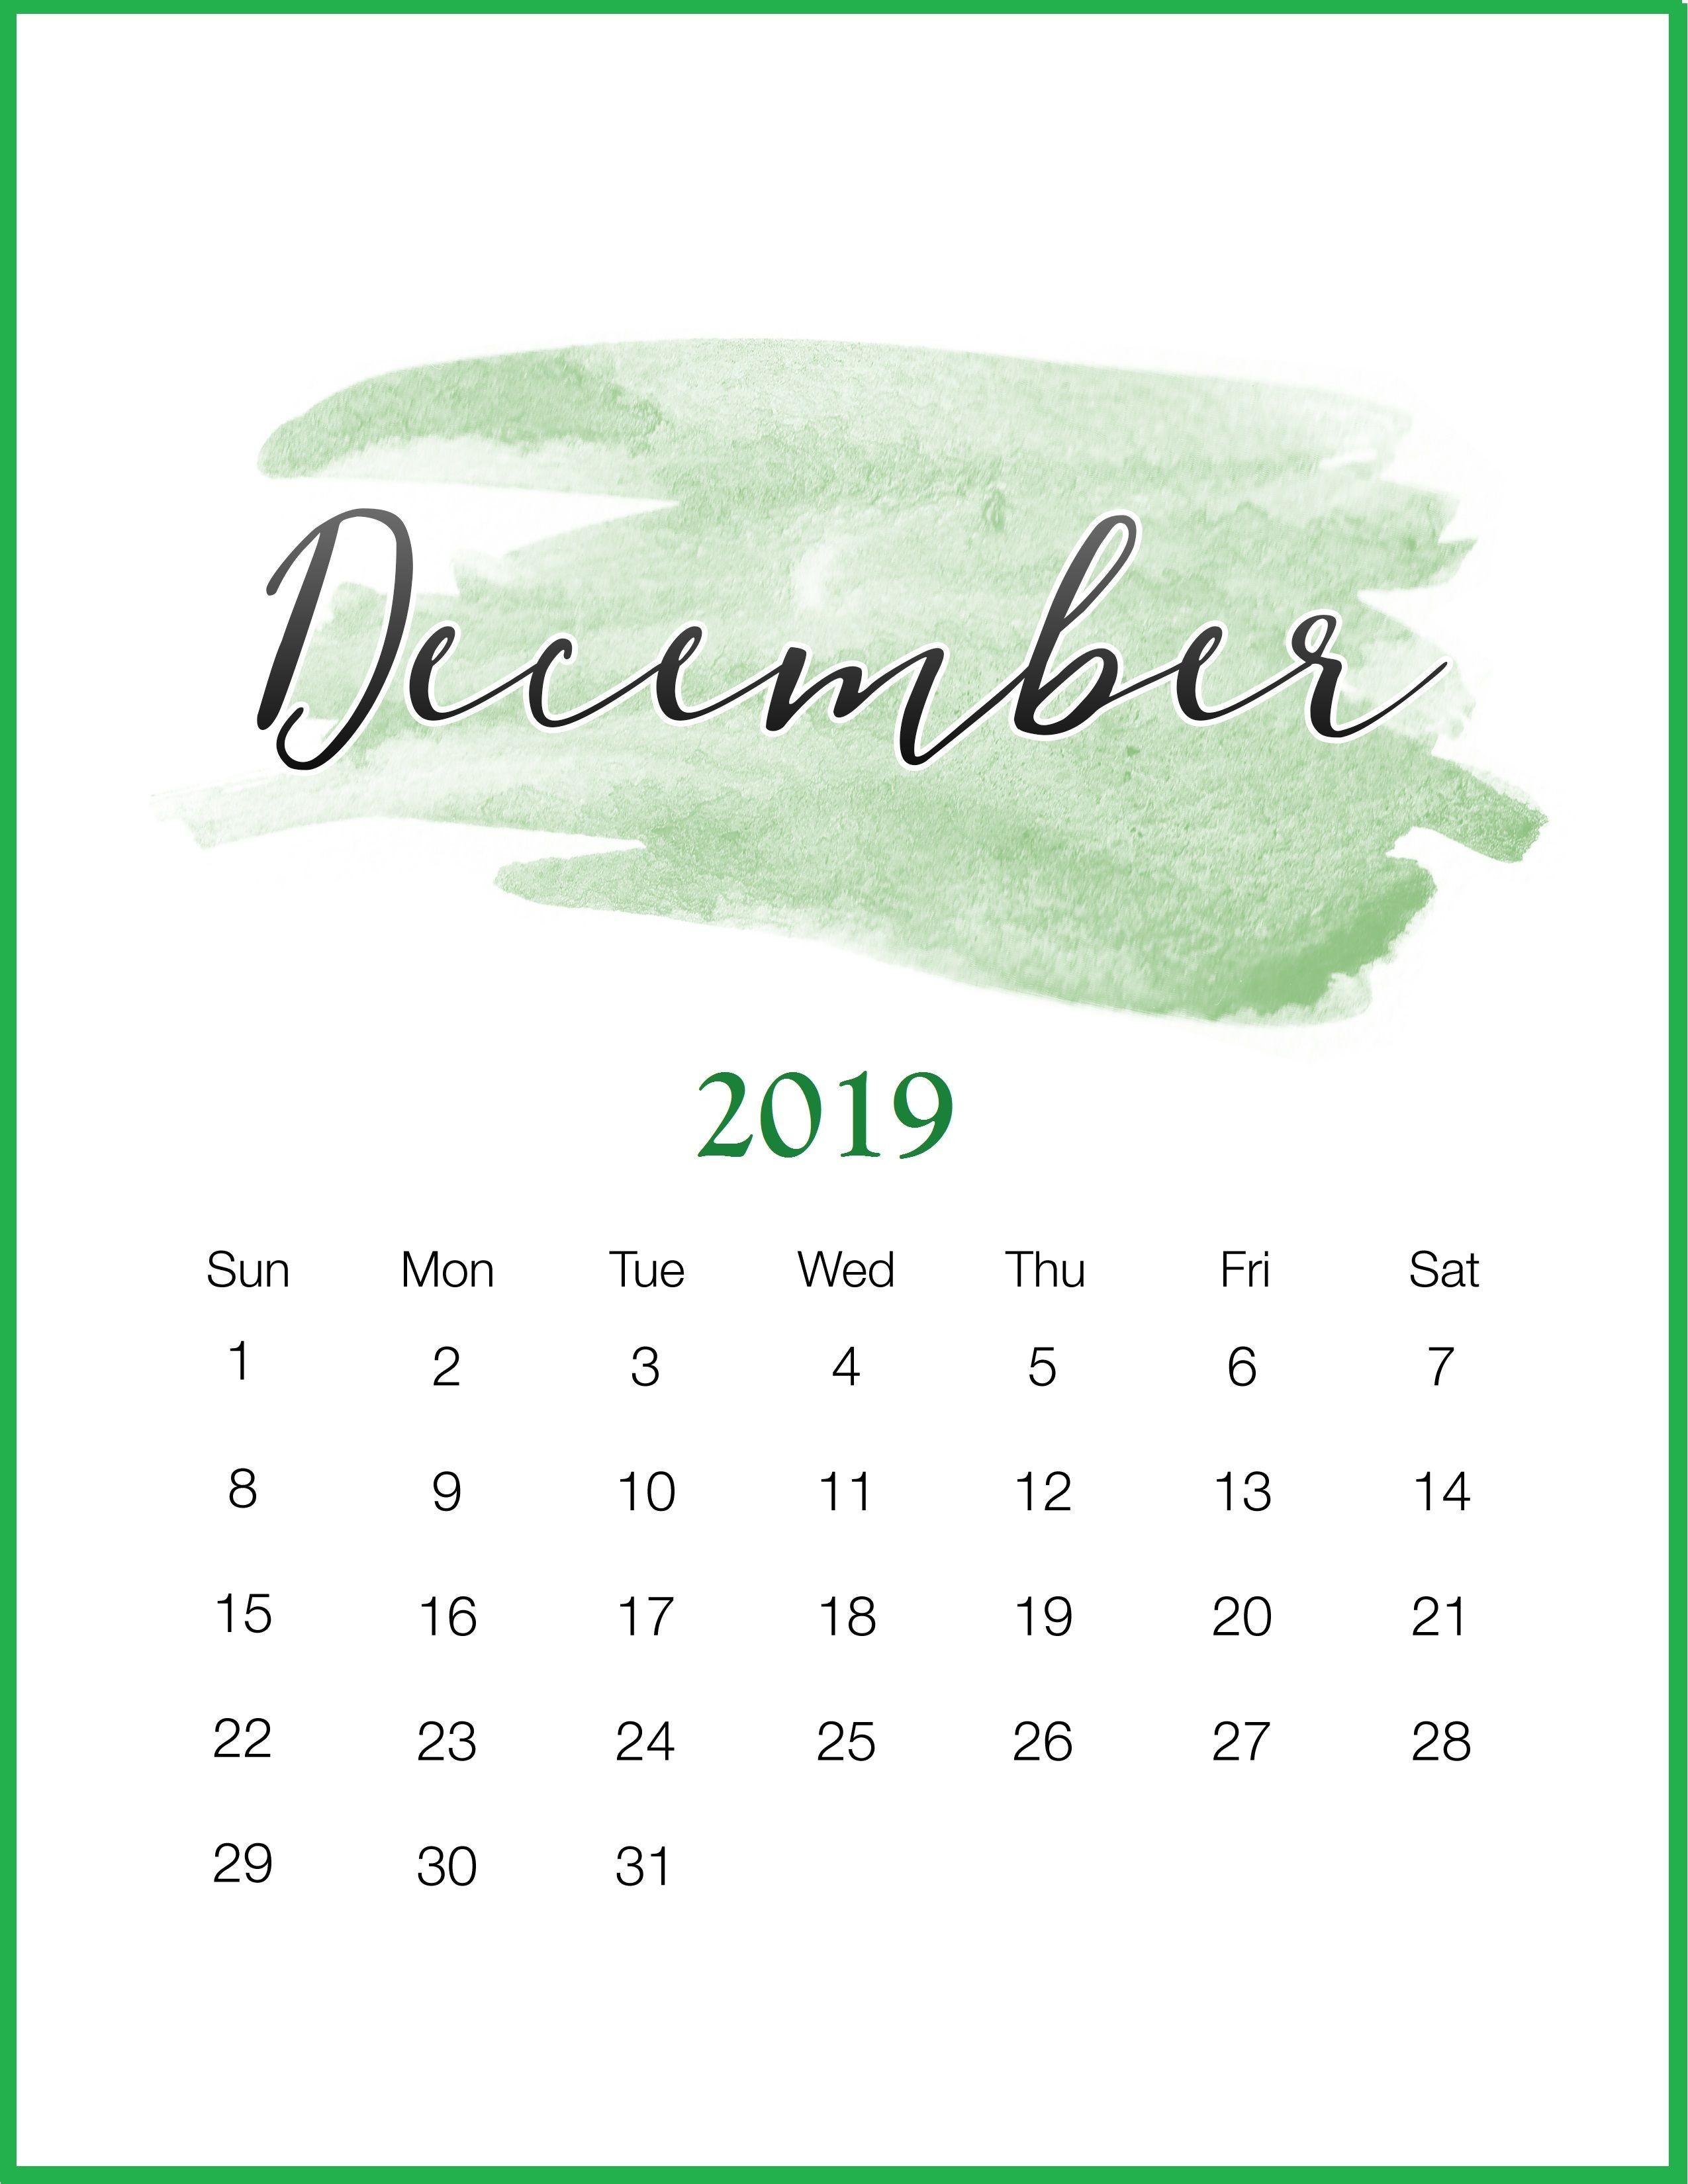 Watercolor 2019 December Printable Calendar December Calendar Diy Calendar 2019 Calendar Print Calendar